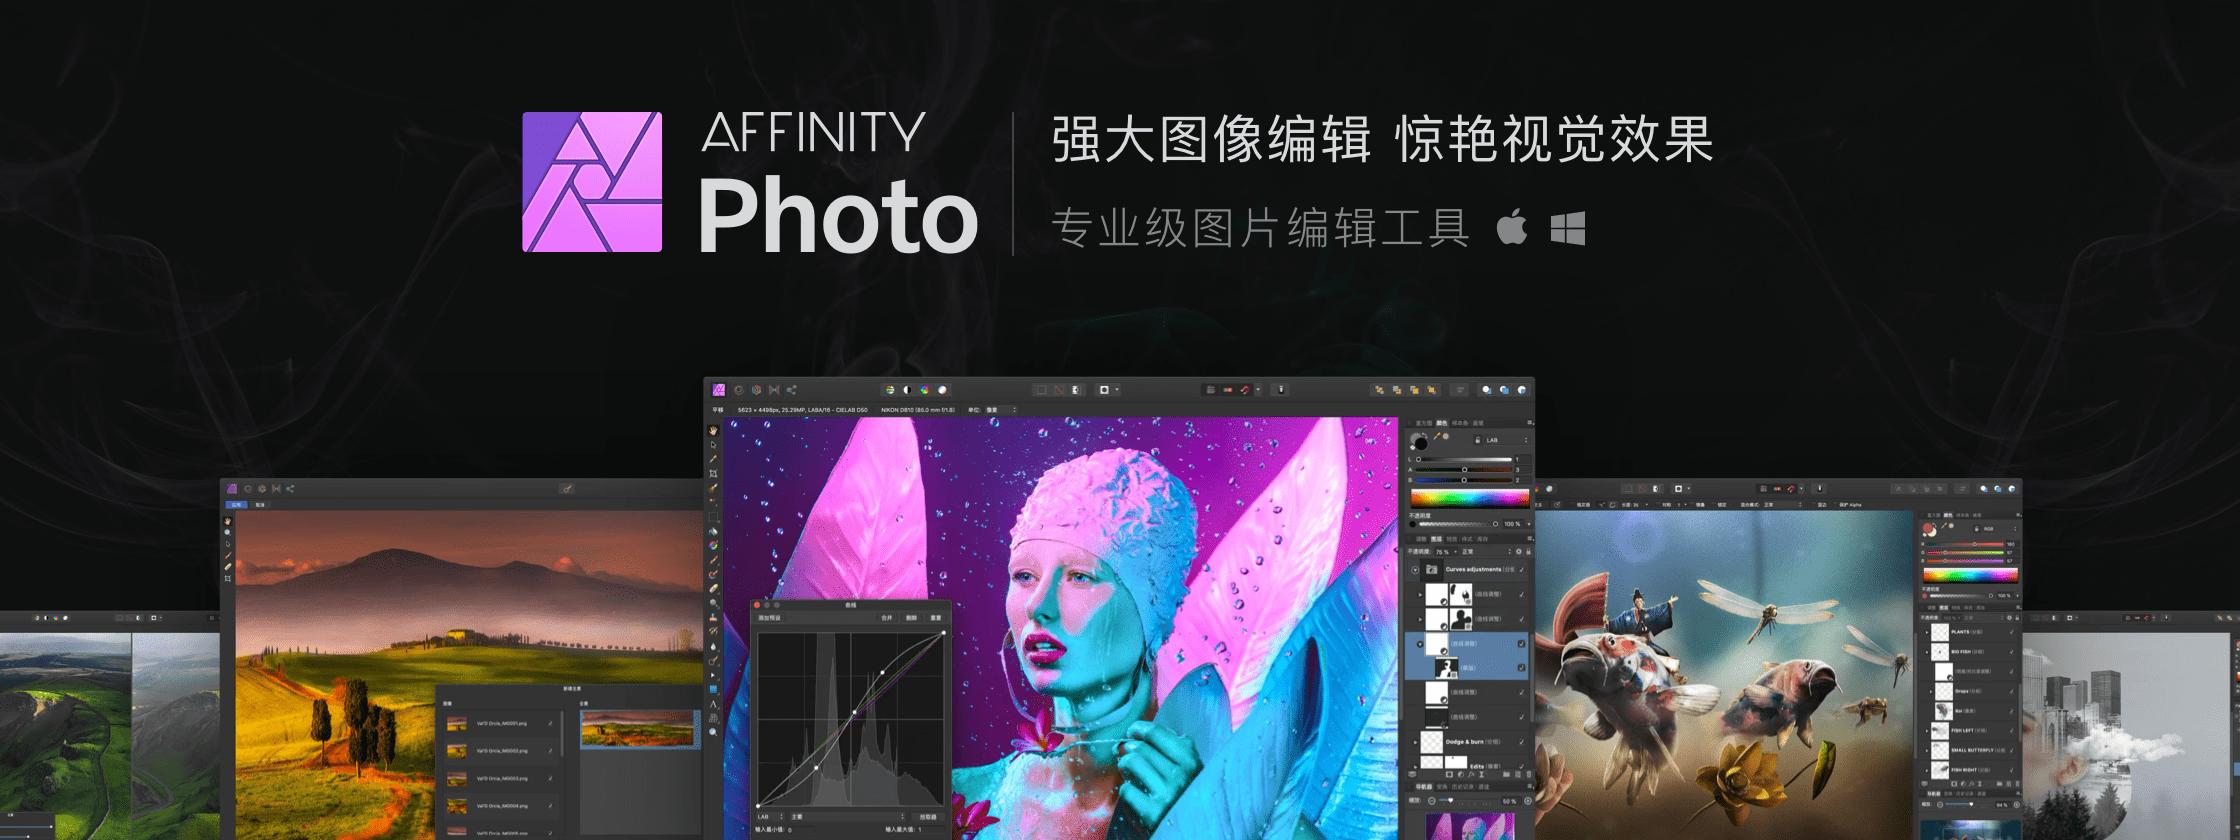 Affinity Photo – 专业级图像处理工具